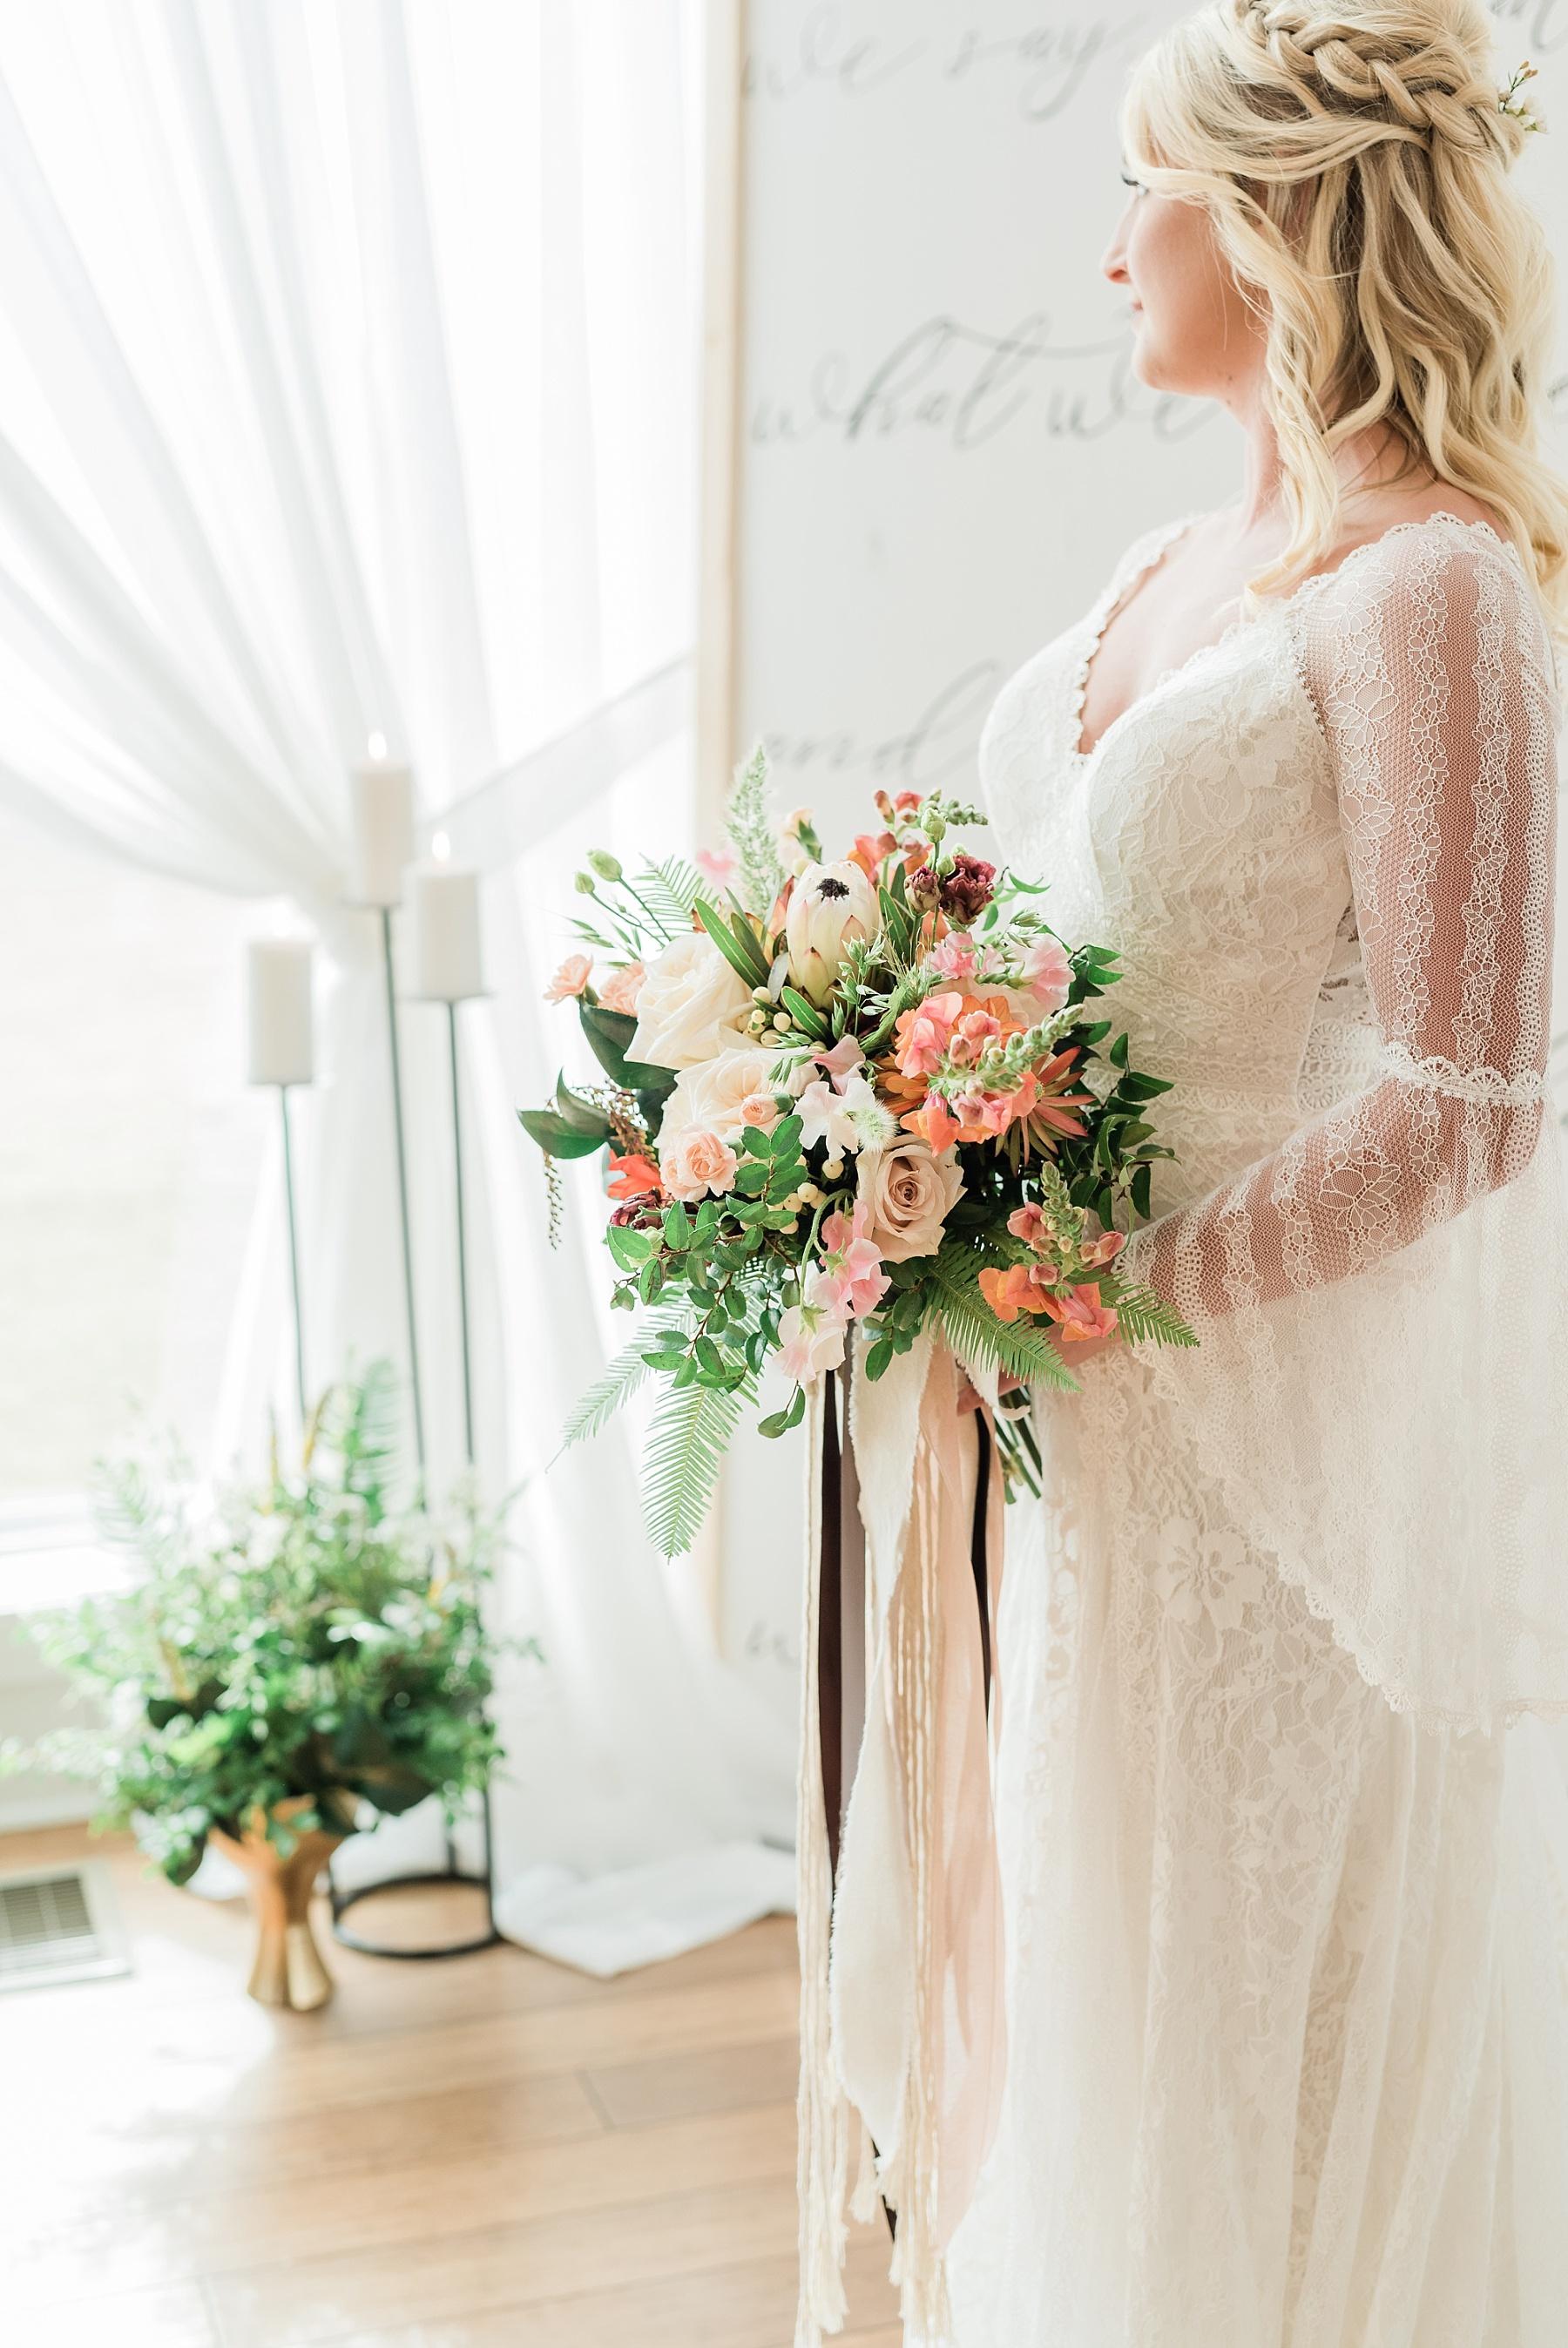 Eclectic Scandinavian Winter Wedding in All White Venue Emerson Fields by Kelsi Kliethermes Photography Best Missouri and Maui Wedding Photographer_0085.jpg